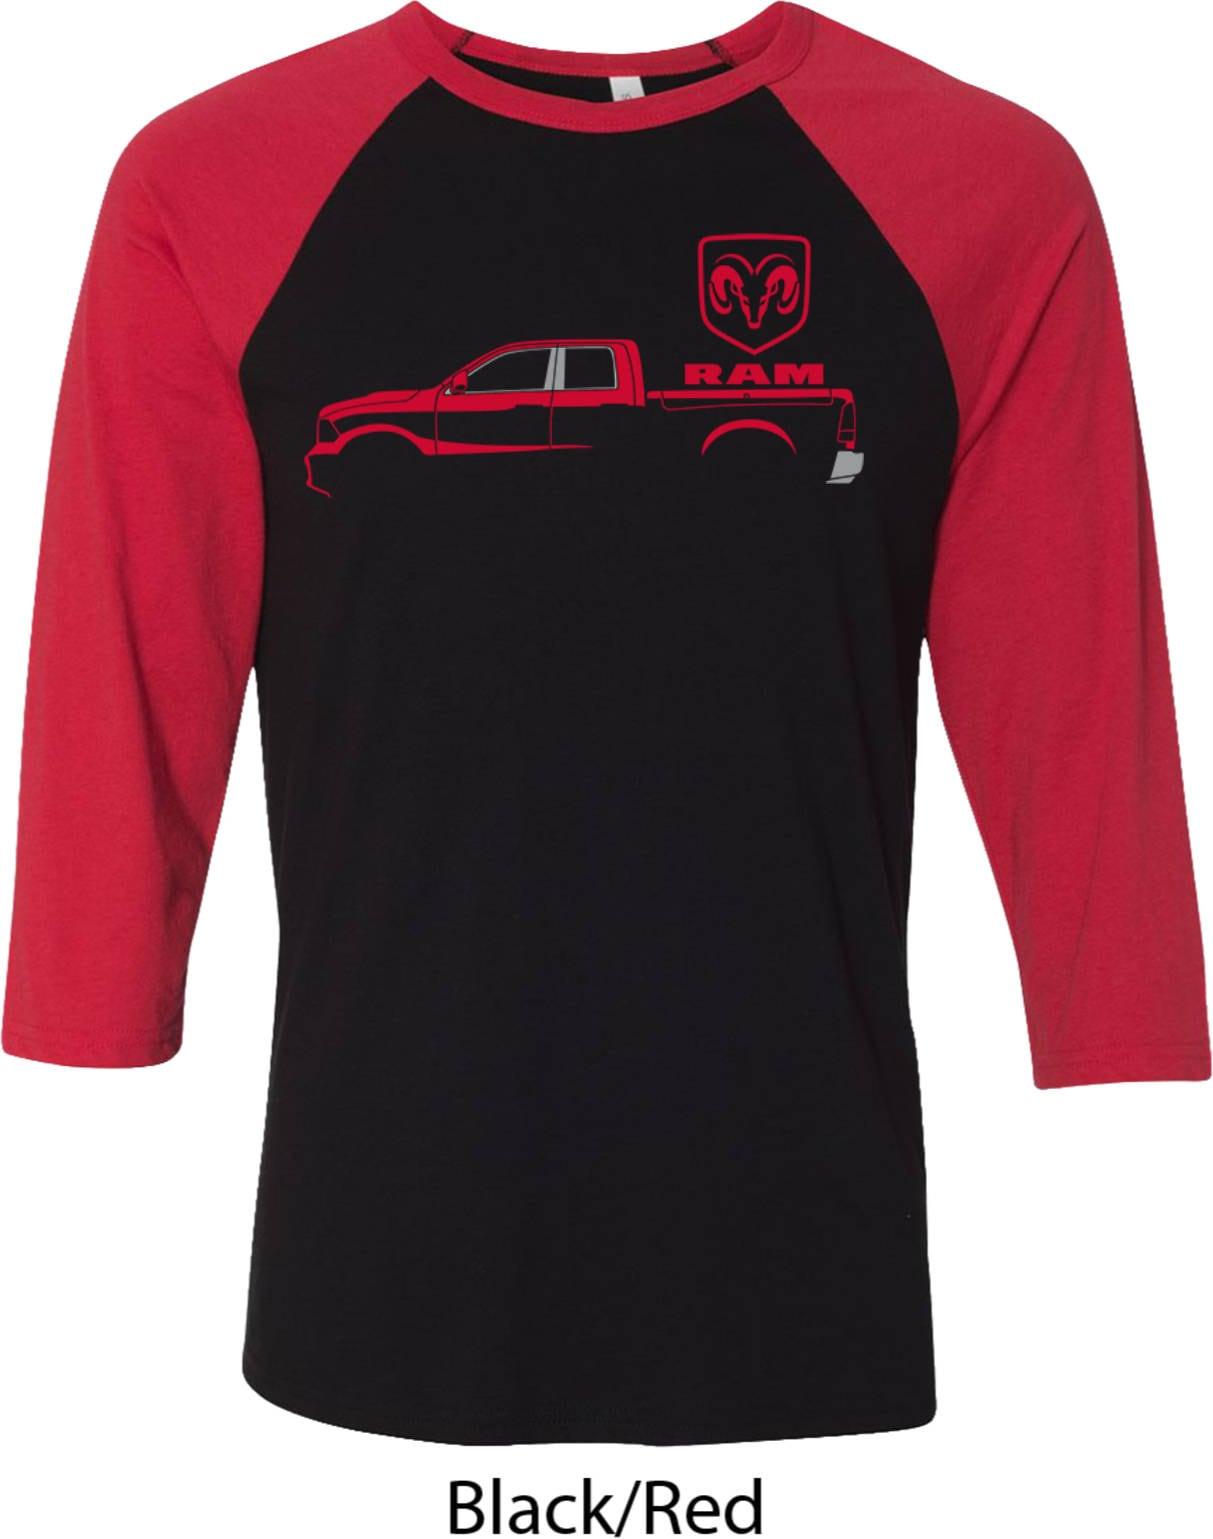 Mens Red Dodge Ram Silhouette Raglan Shirt 21539e2 3200 Etsy